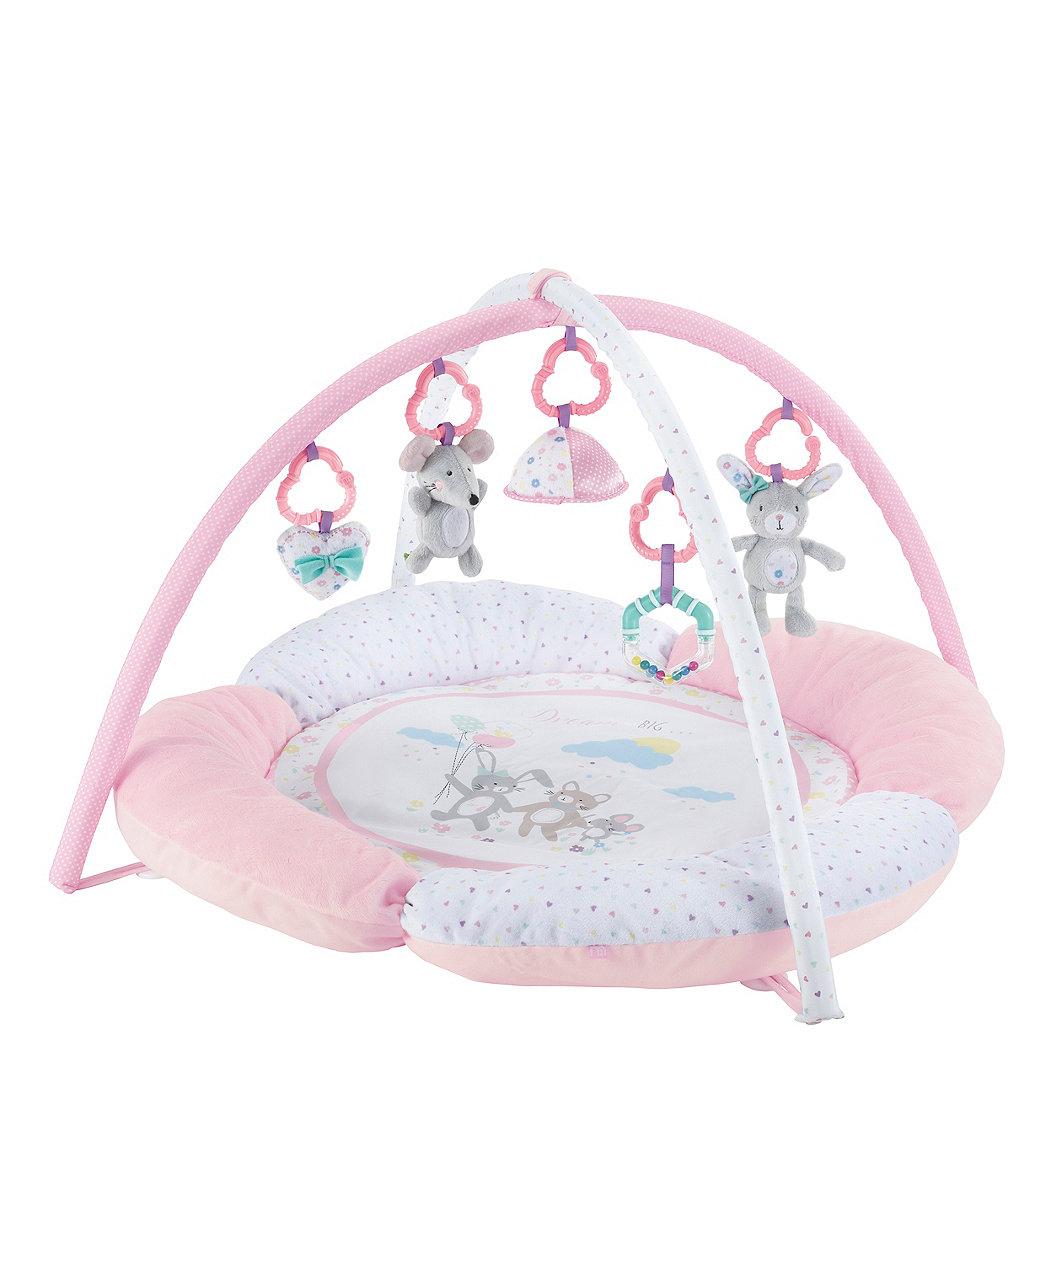 e58a8e52e2ff confetti party playmat with toy arch